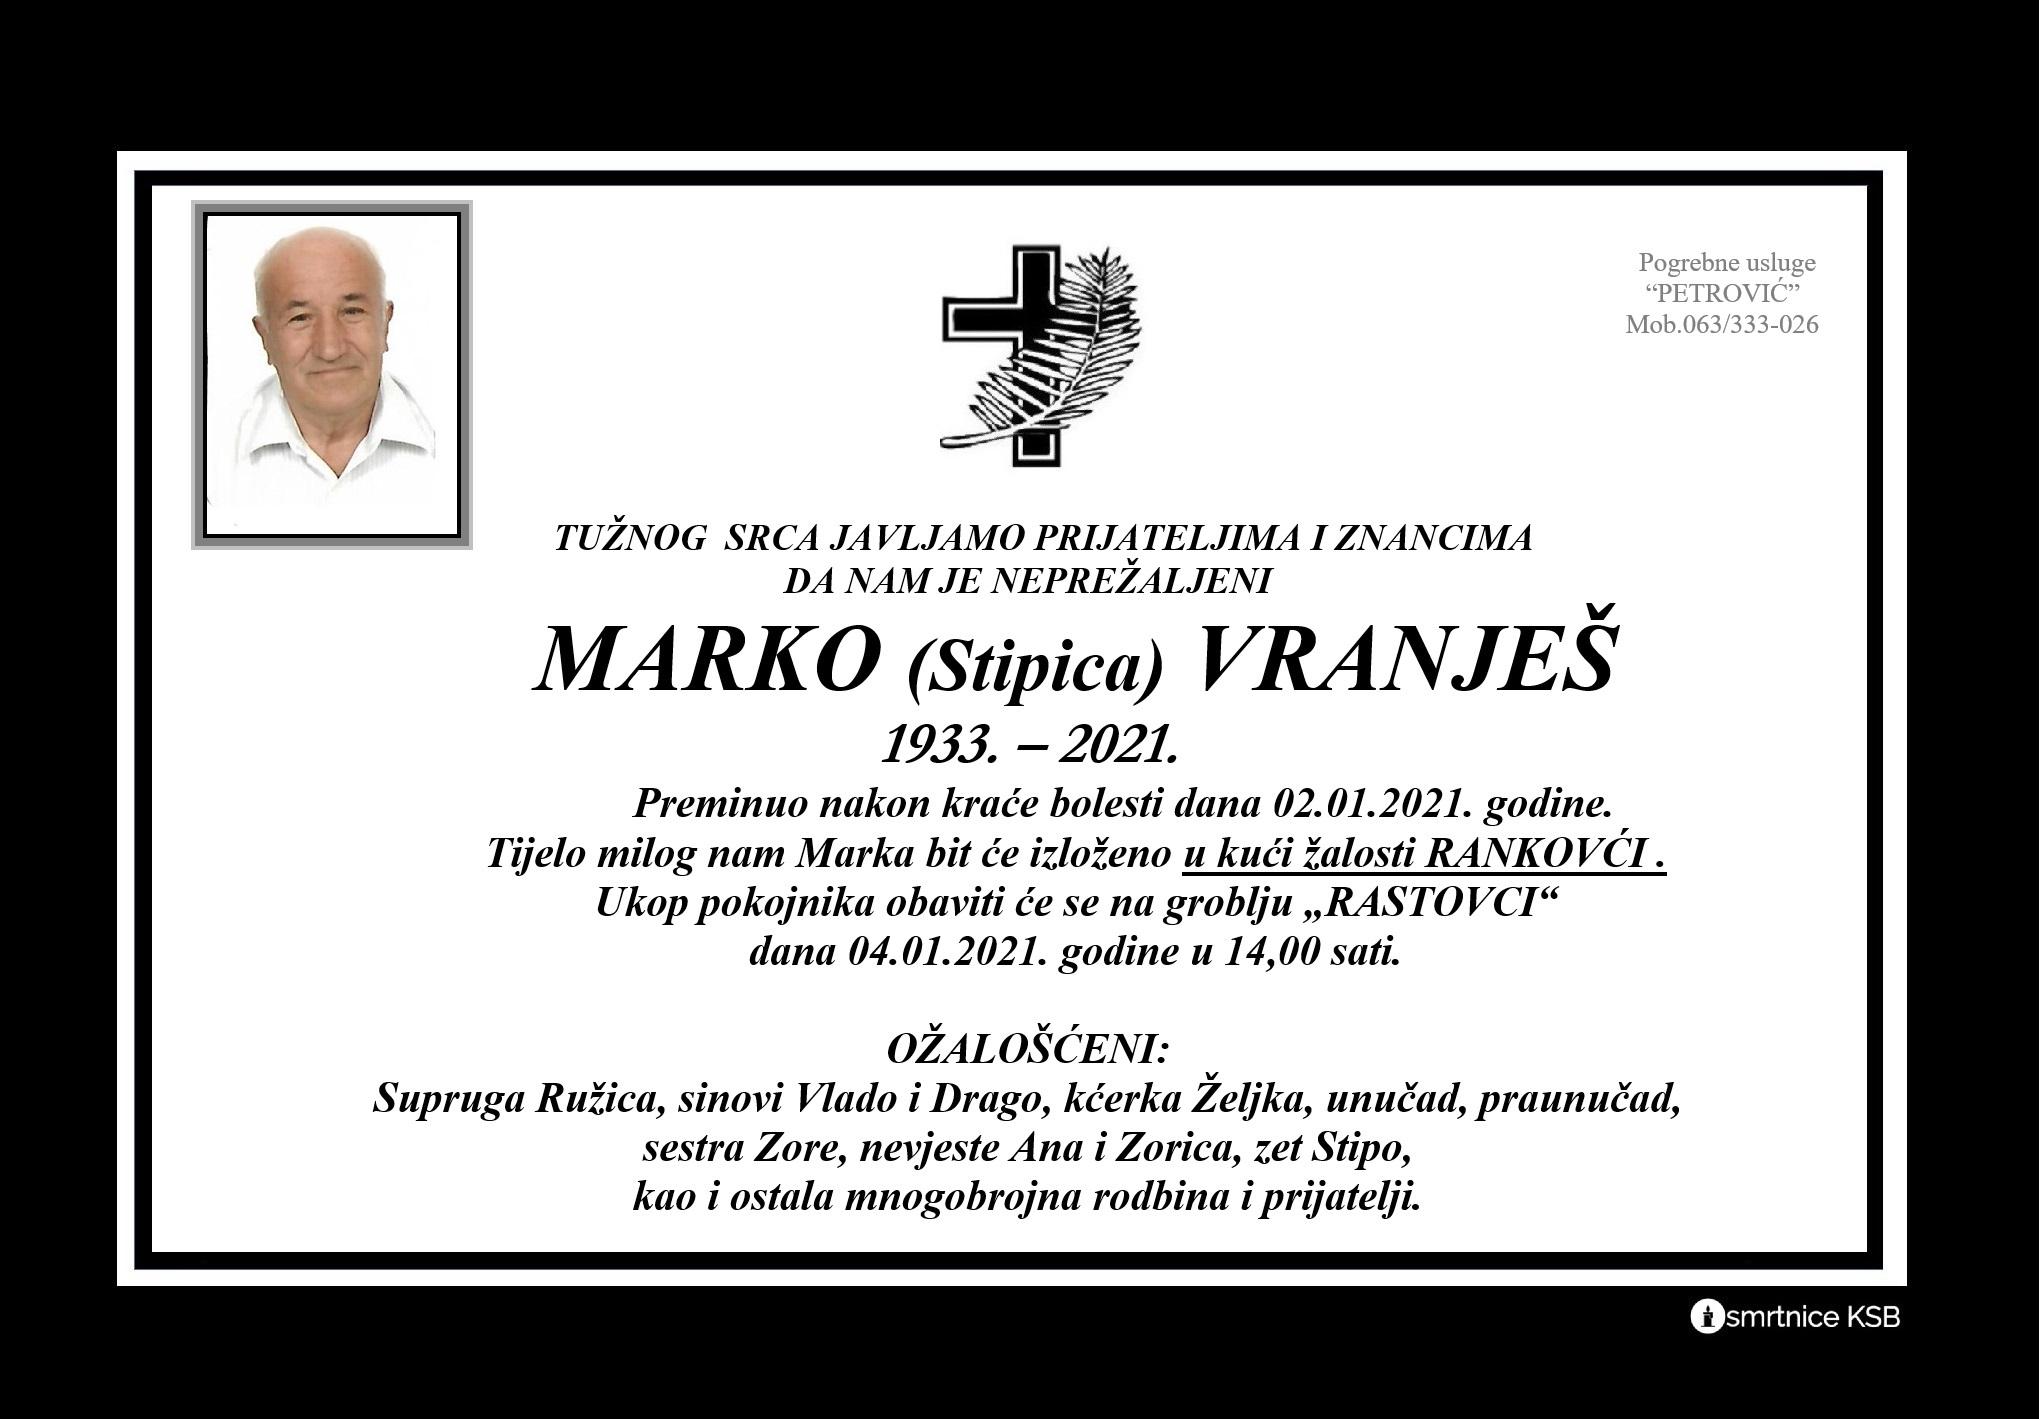 Marko (Stipica) Vranješ